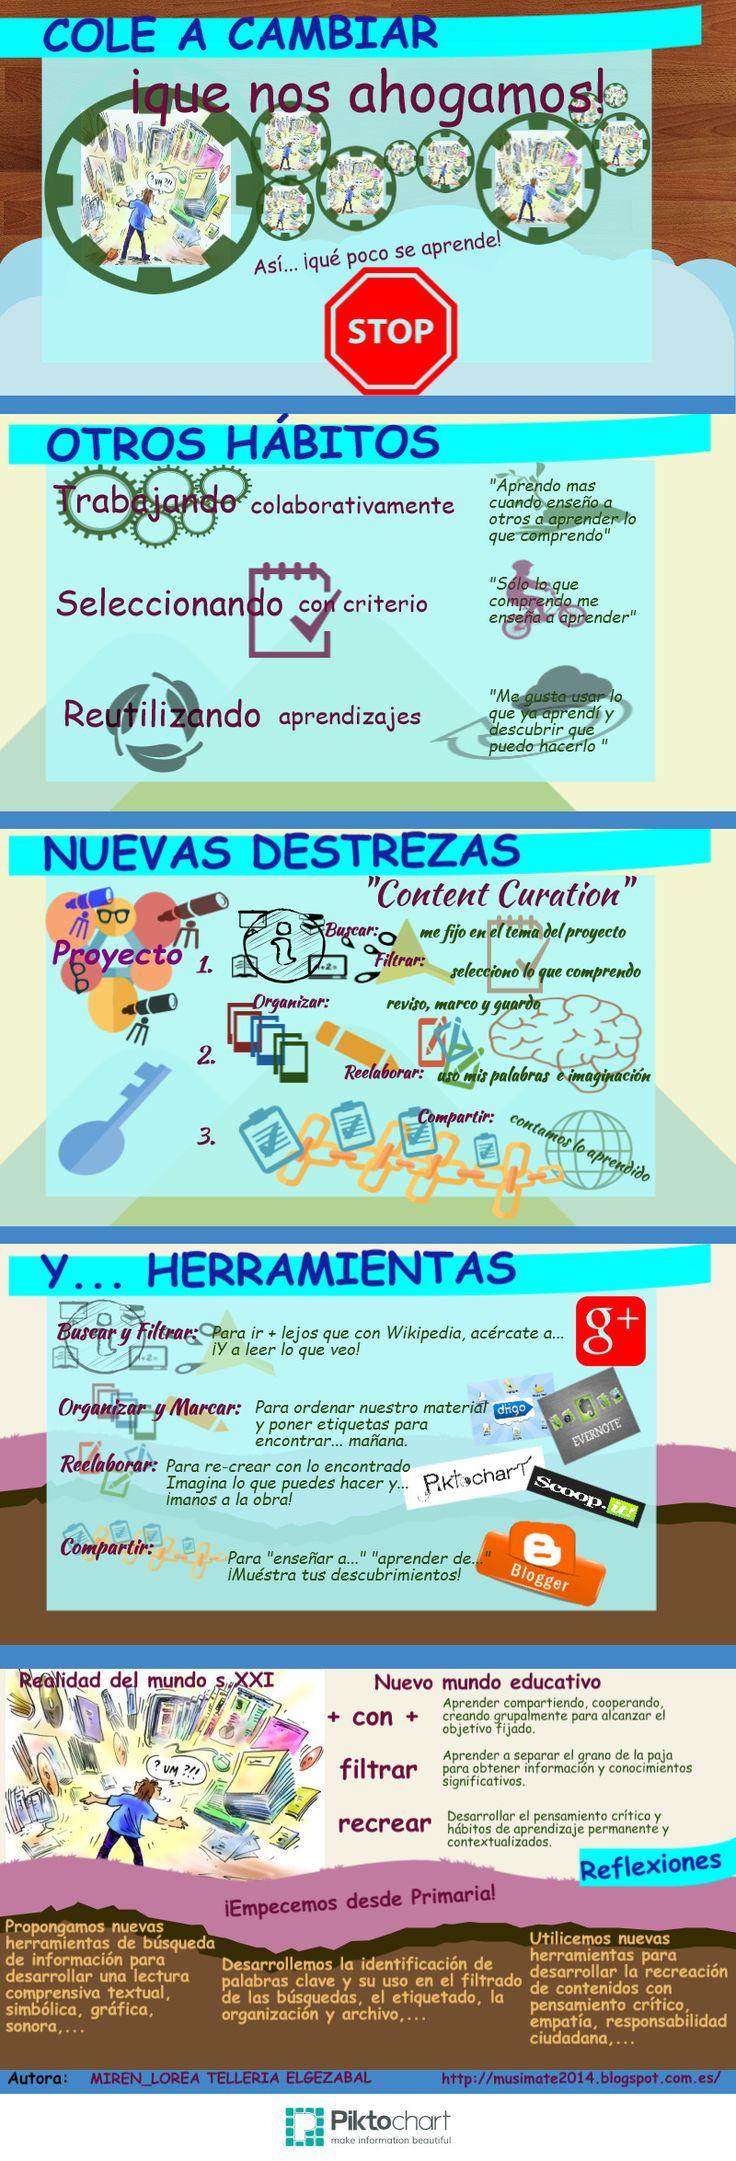 Unidad 5 Infografía | @Piktochart Infographic